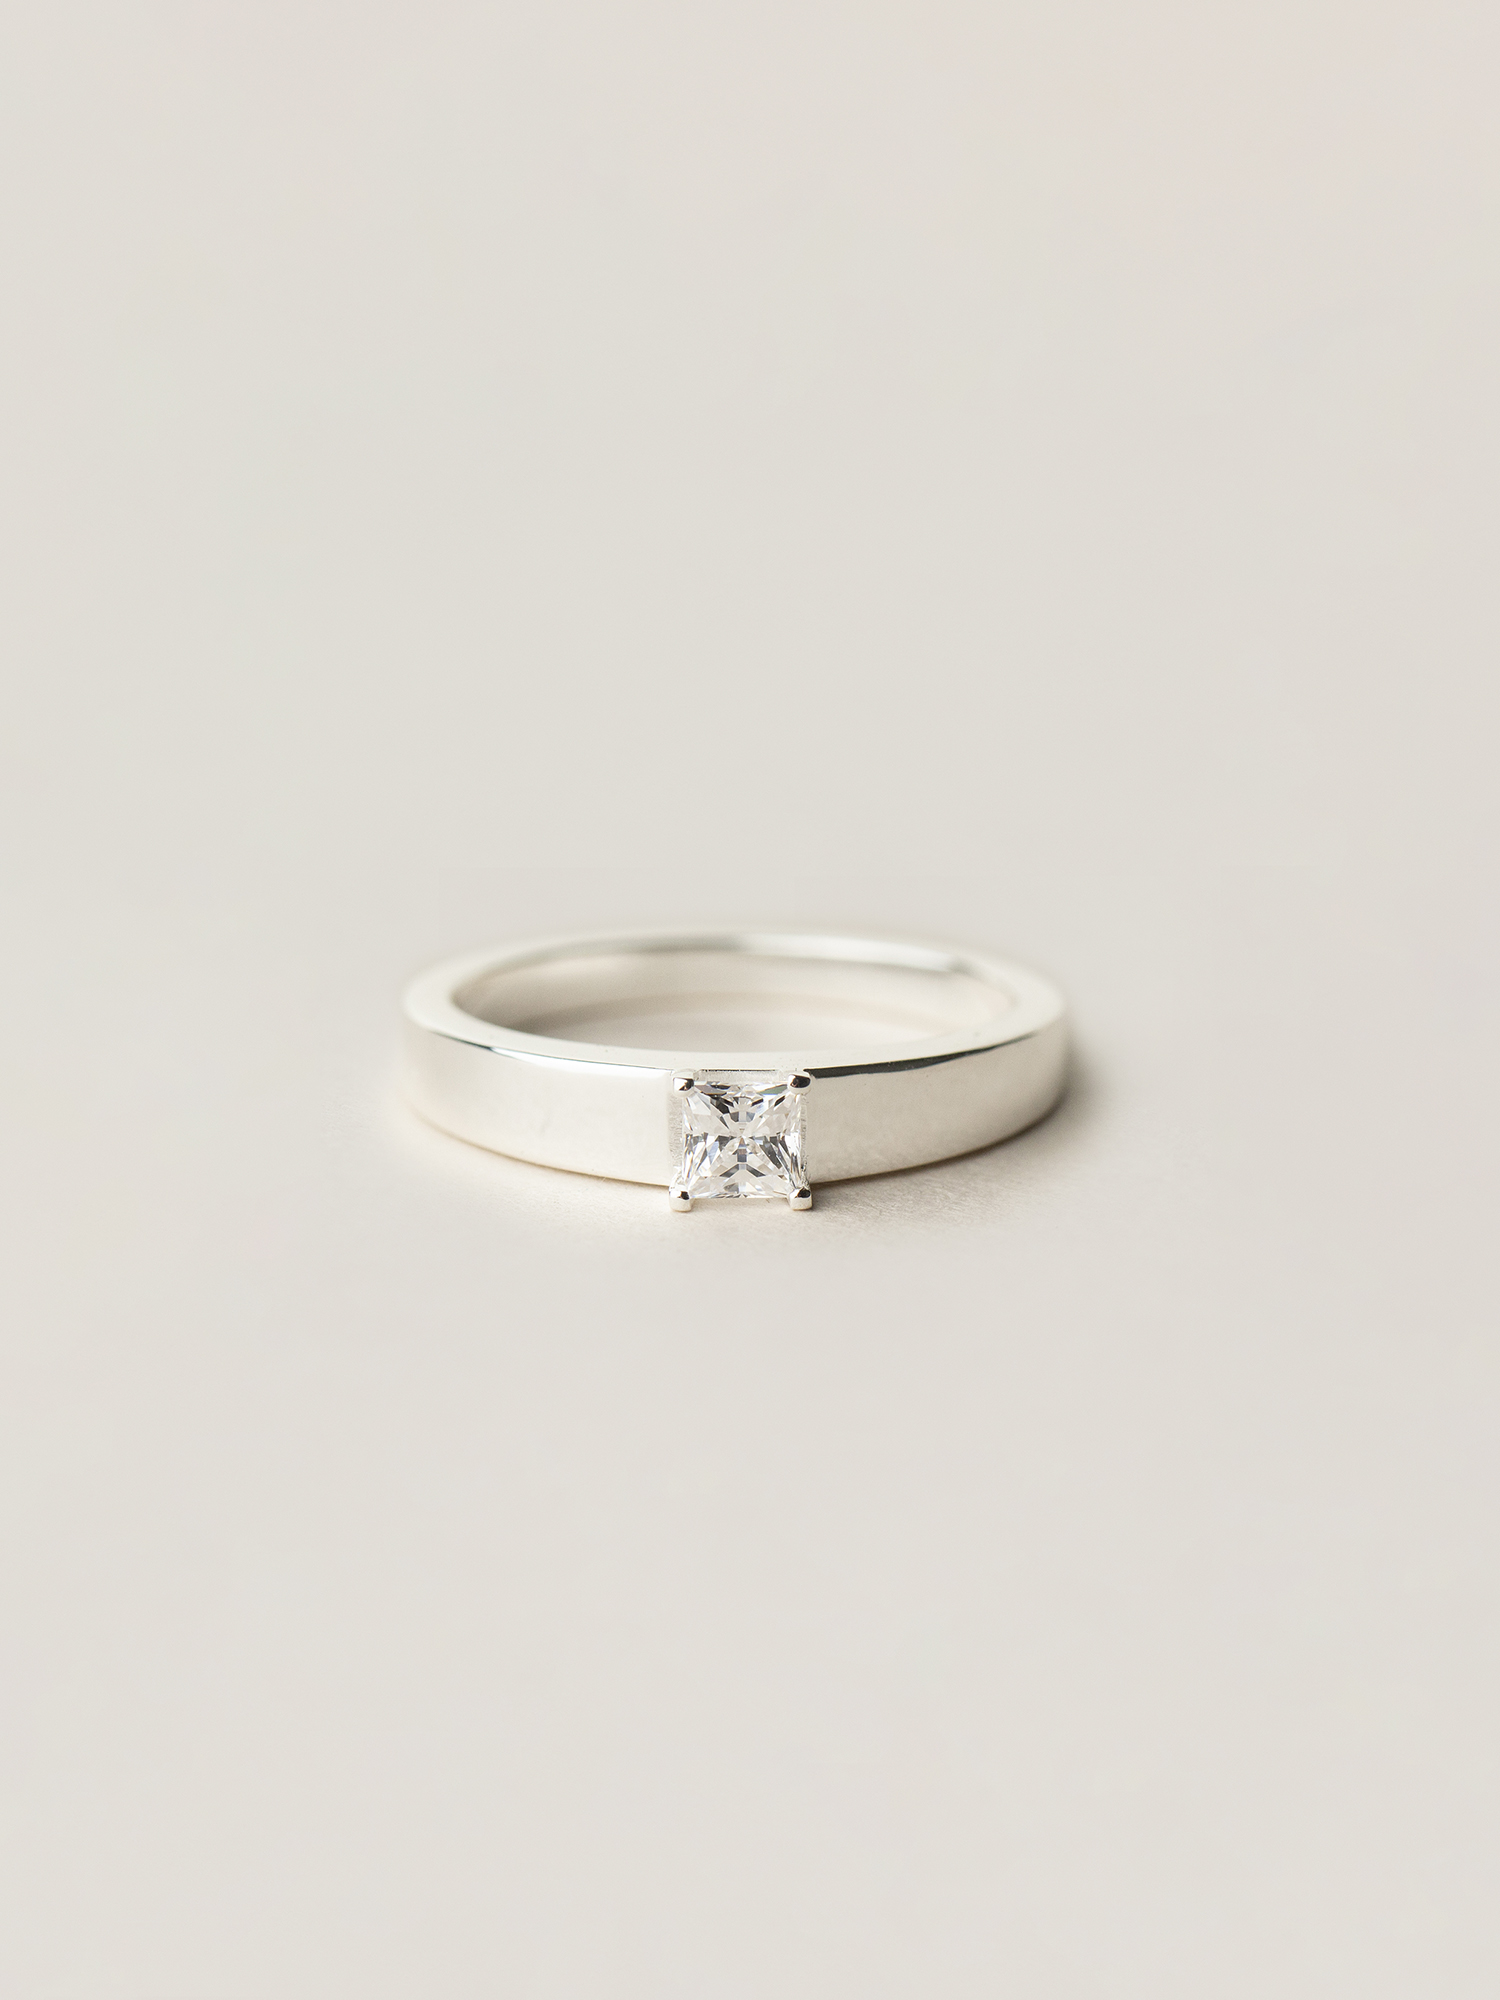 Christina-Pauls-Minima-Prinzess-Diamant-Silber.jpg